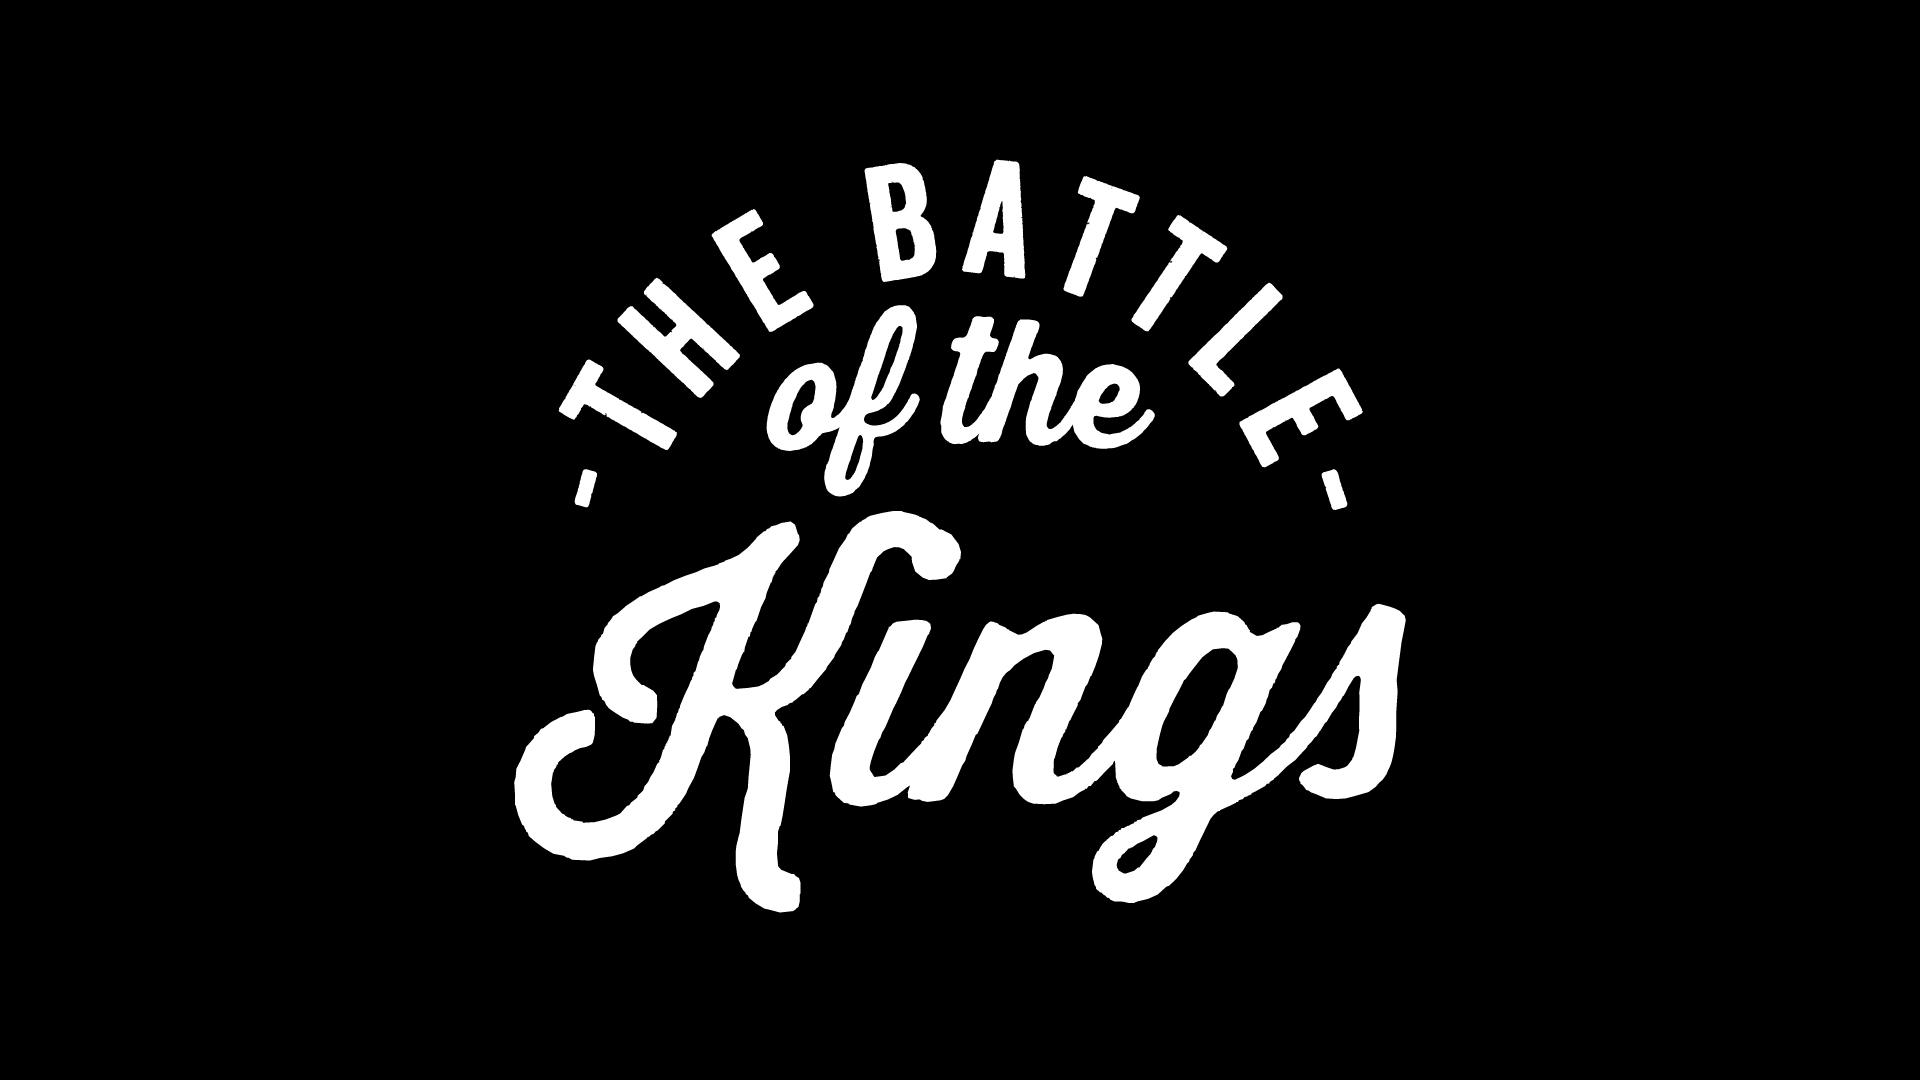 harley davidson - batlle of the kings